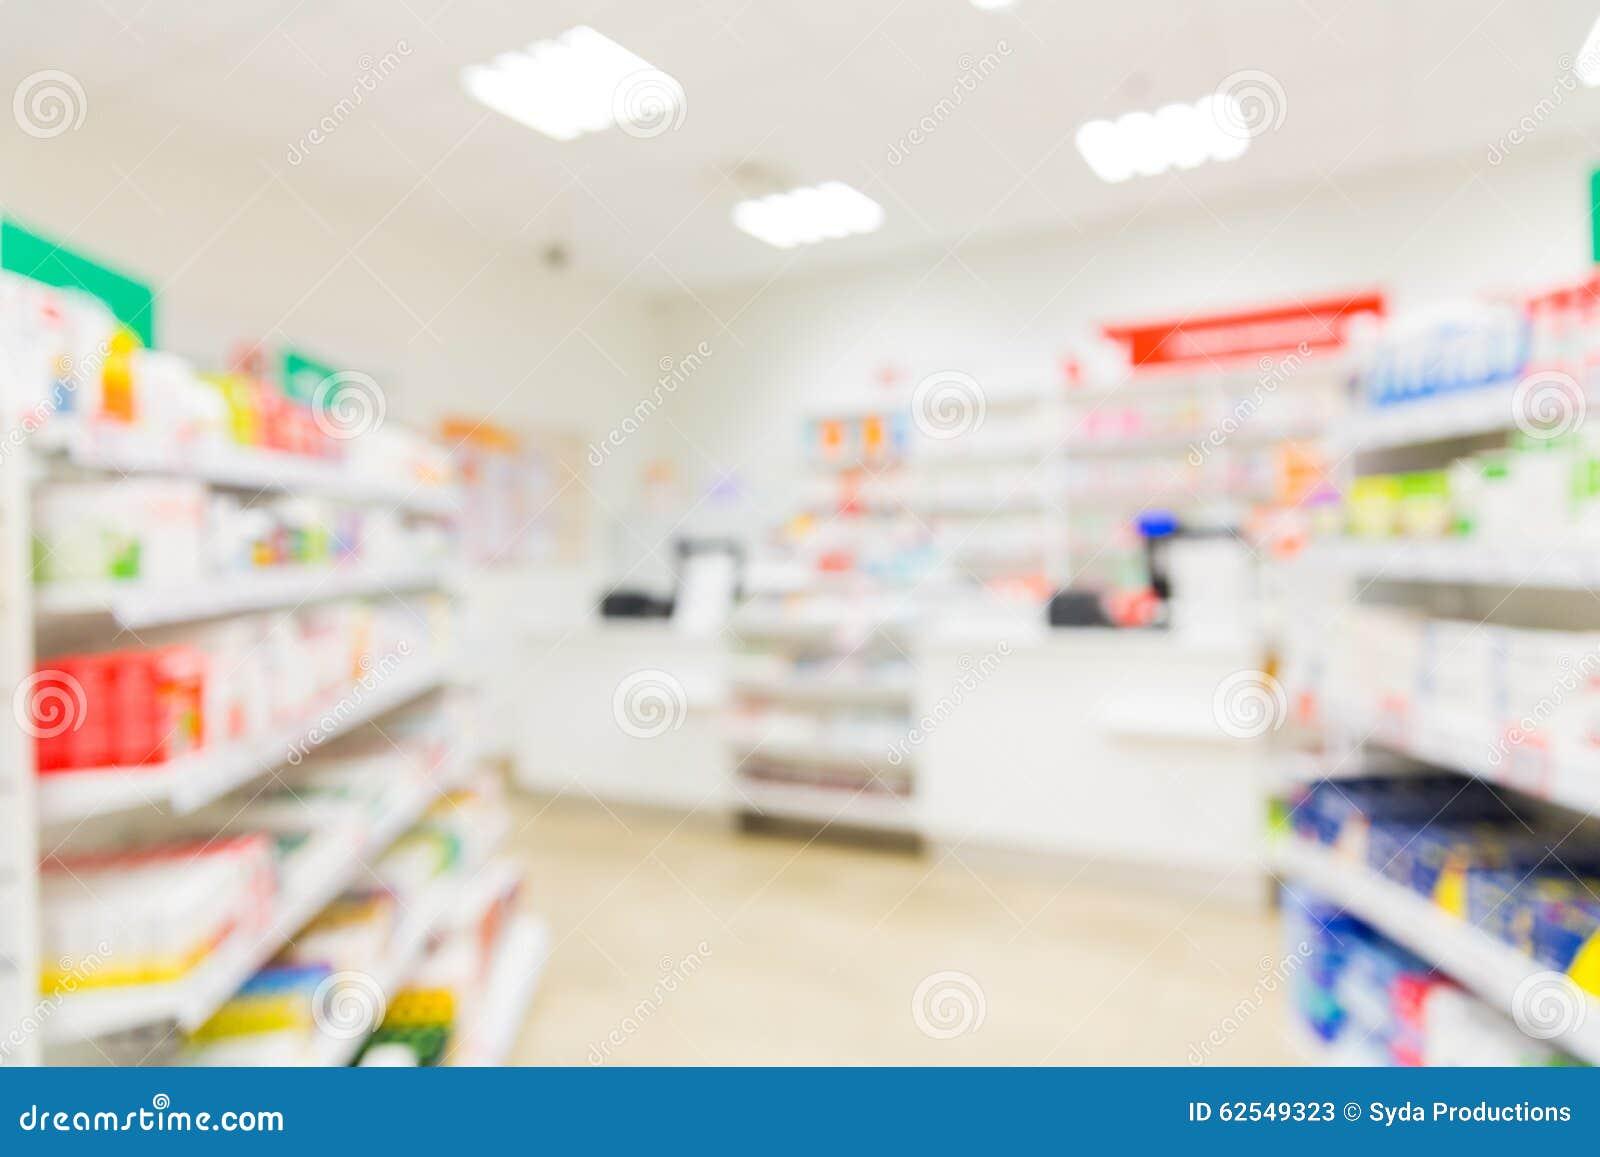 Pharmacy Or Drugstore Room Background Stock Photo - Image